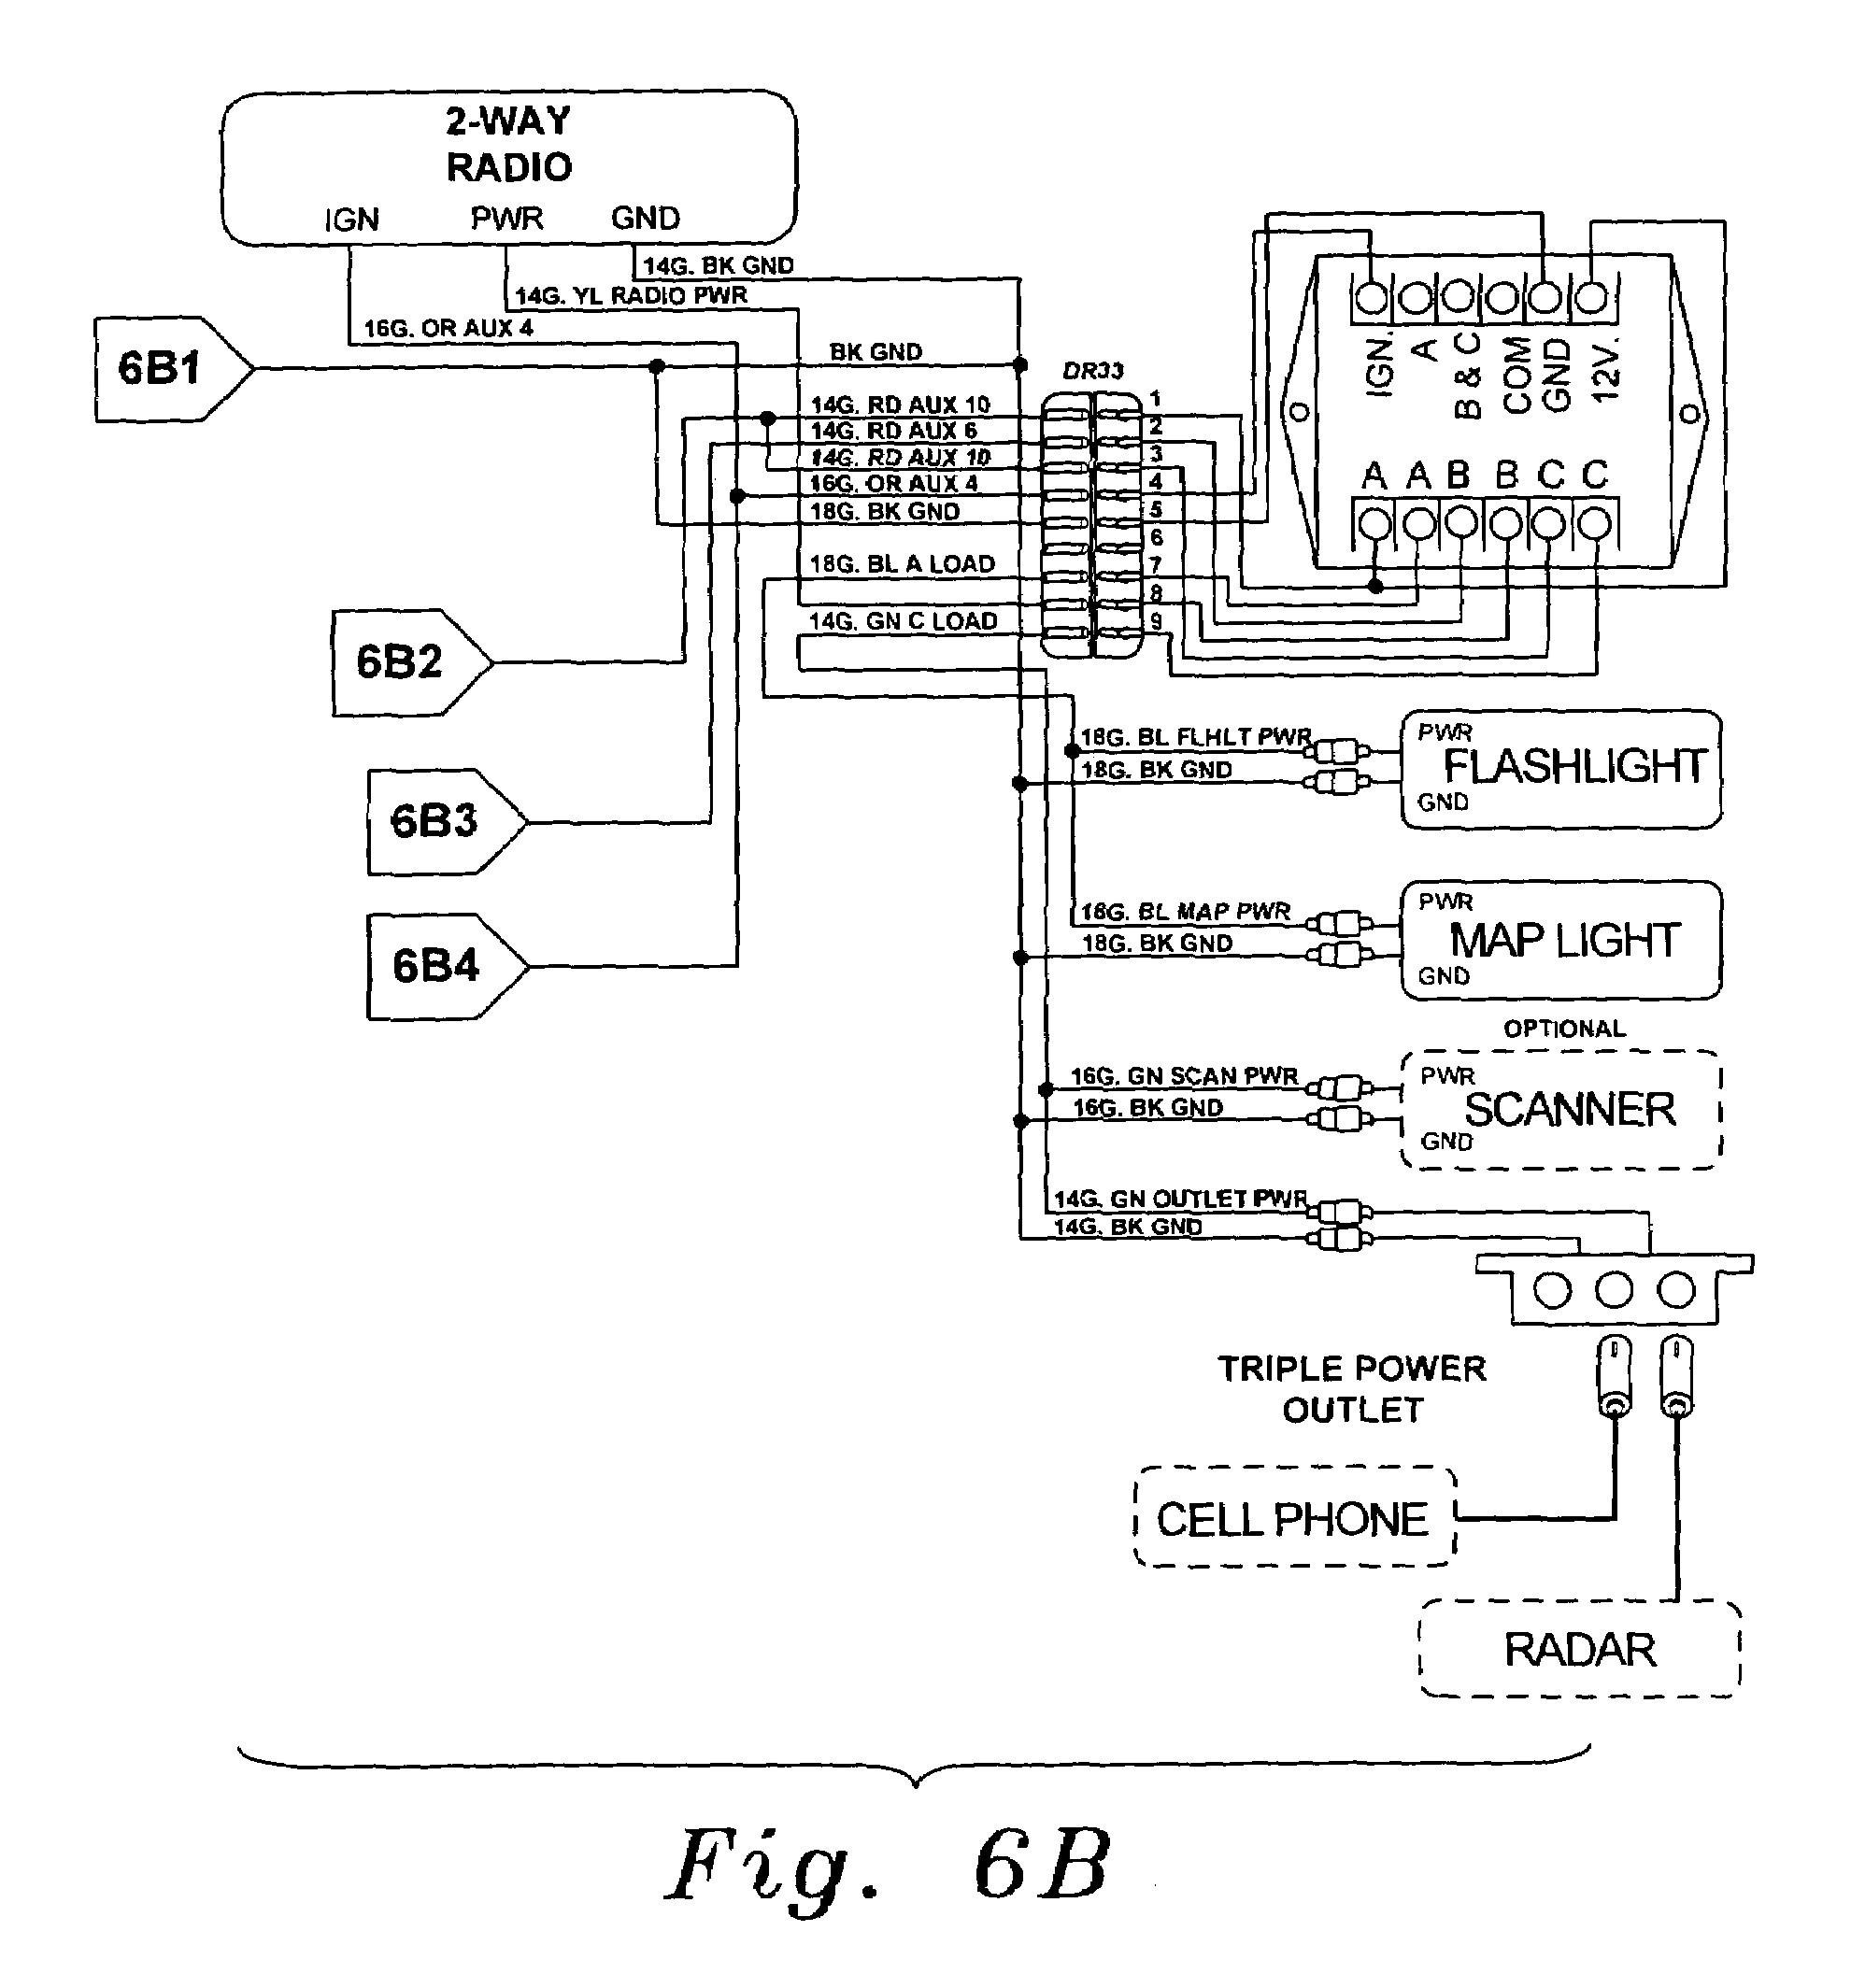 horn strobe sync wiring diagram best site wiring harness rh omniwindenergy com Simple 12V Horn Wiring Diagram system sensor horn strobe wiring diagram